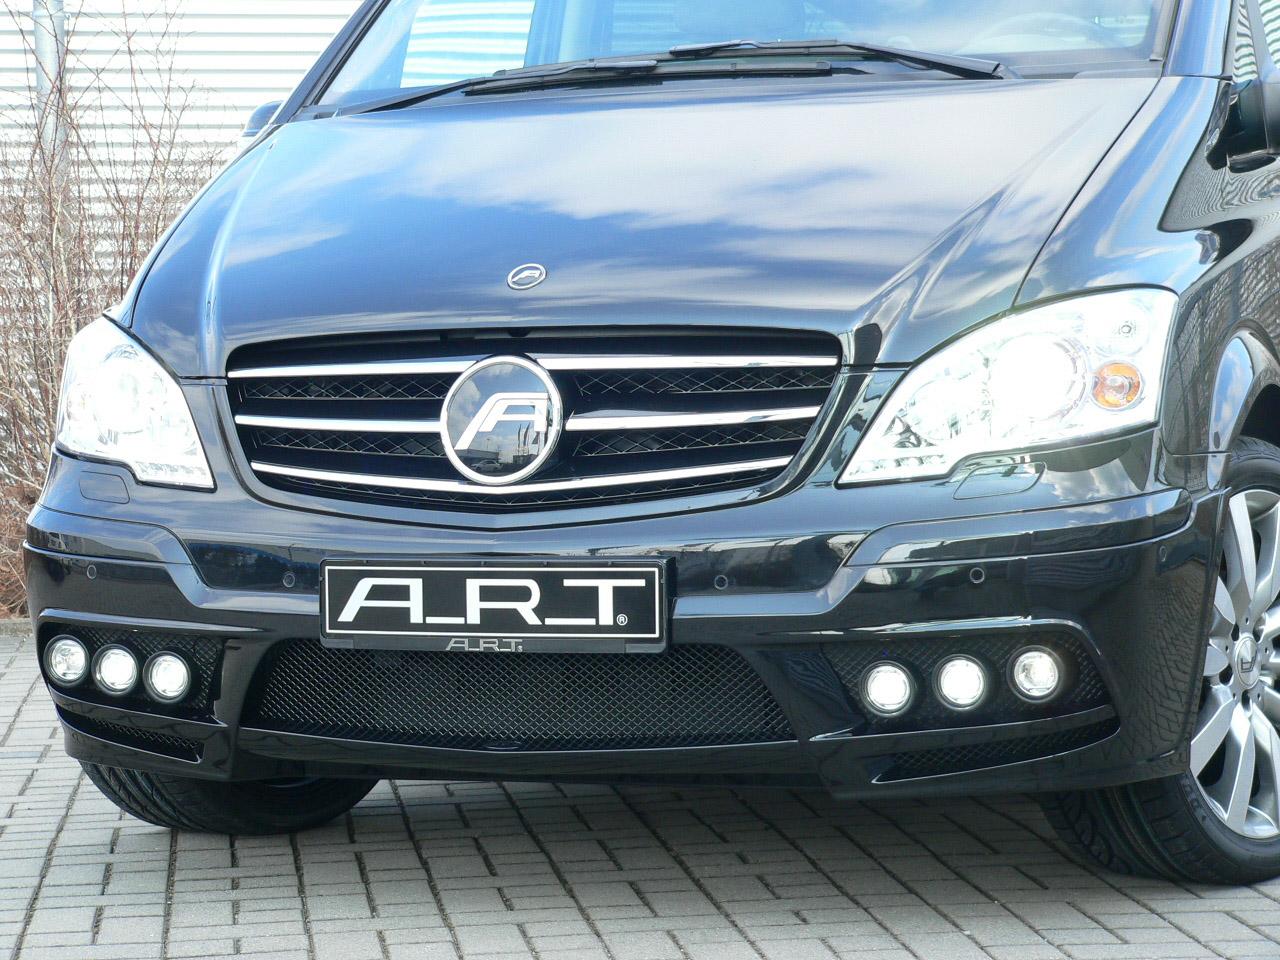 А. Р. Т тюнинг beutifies Mercedes-Benz Viano - фотография №10